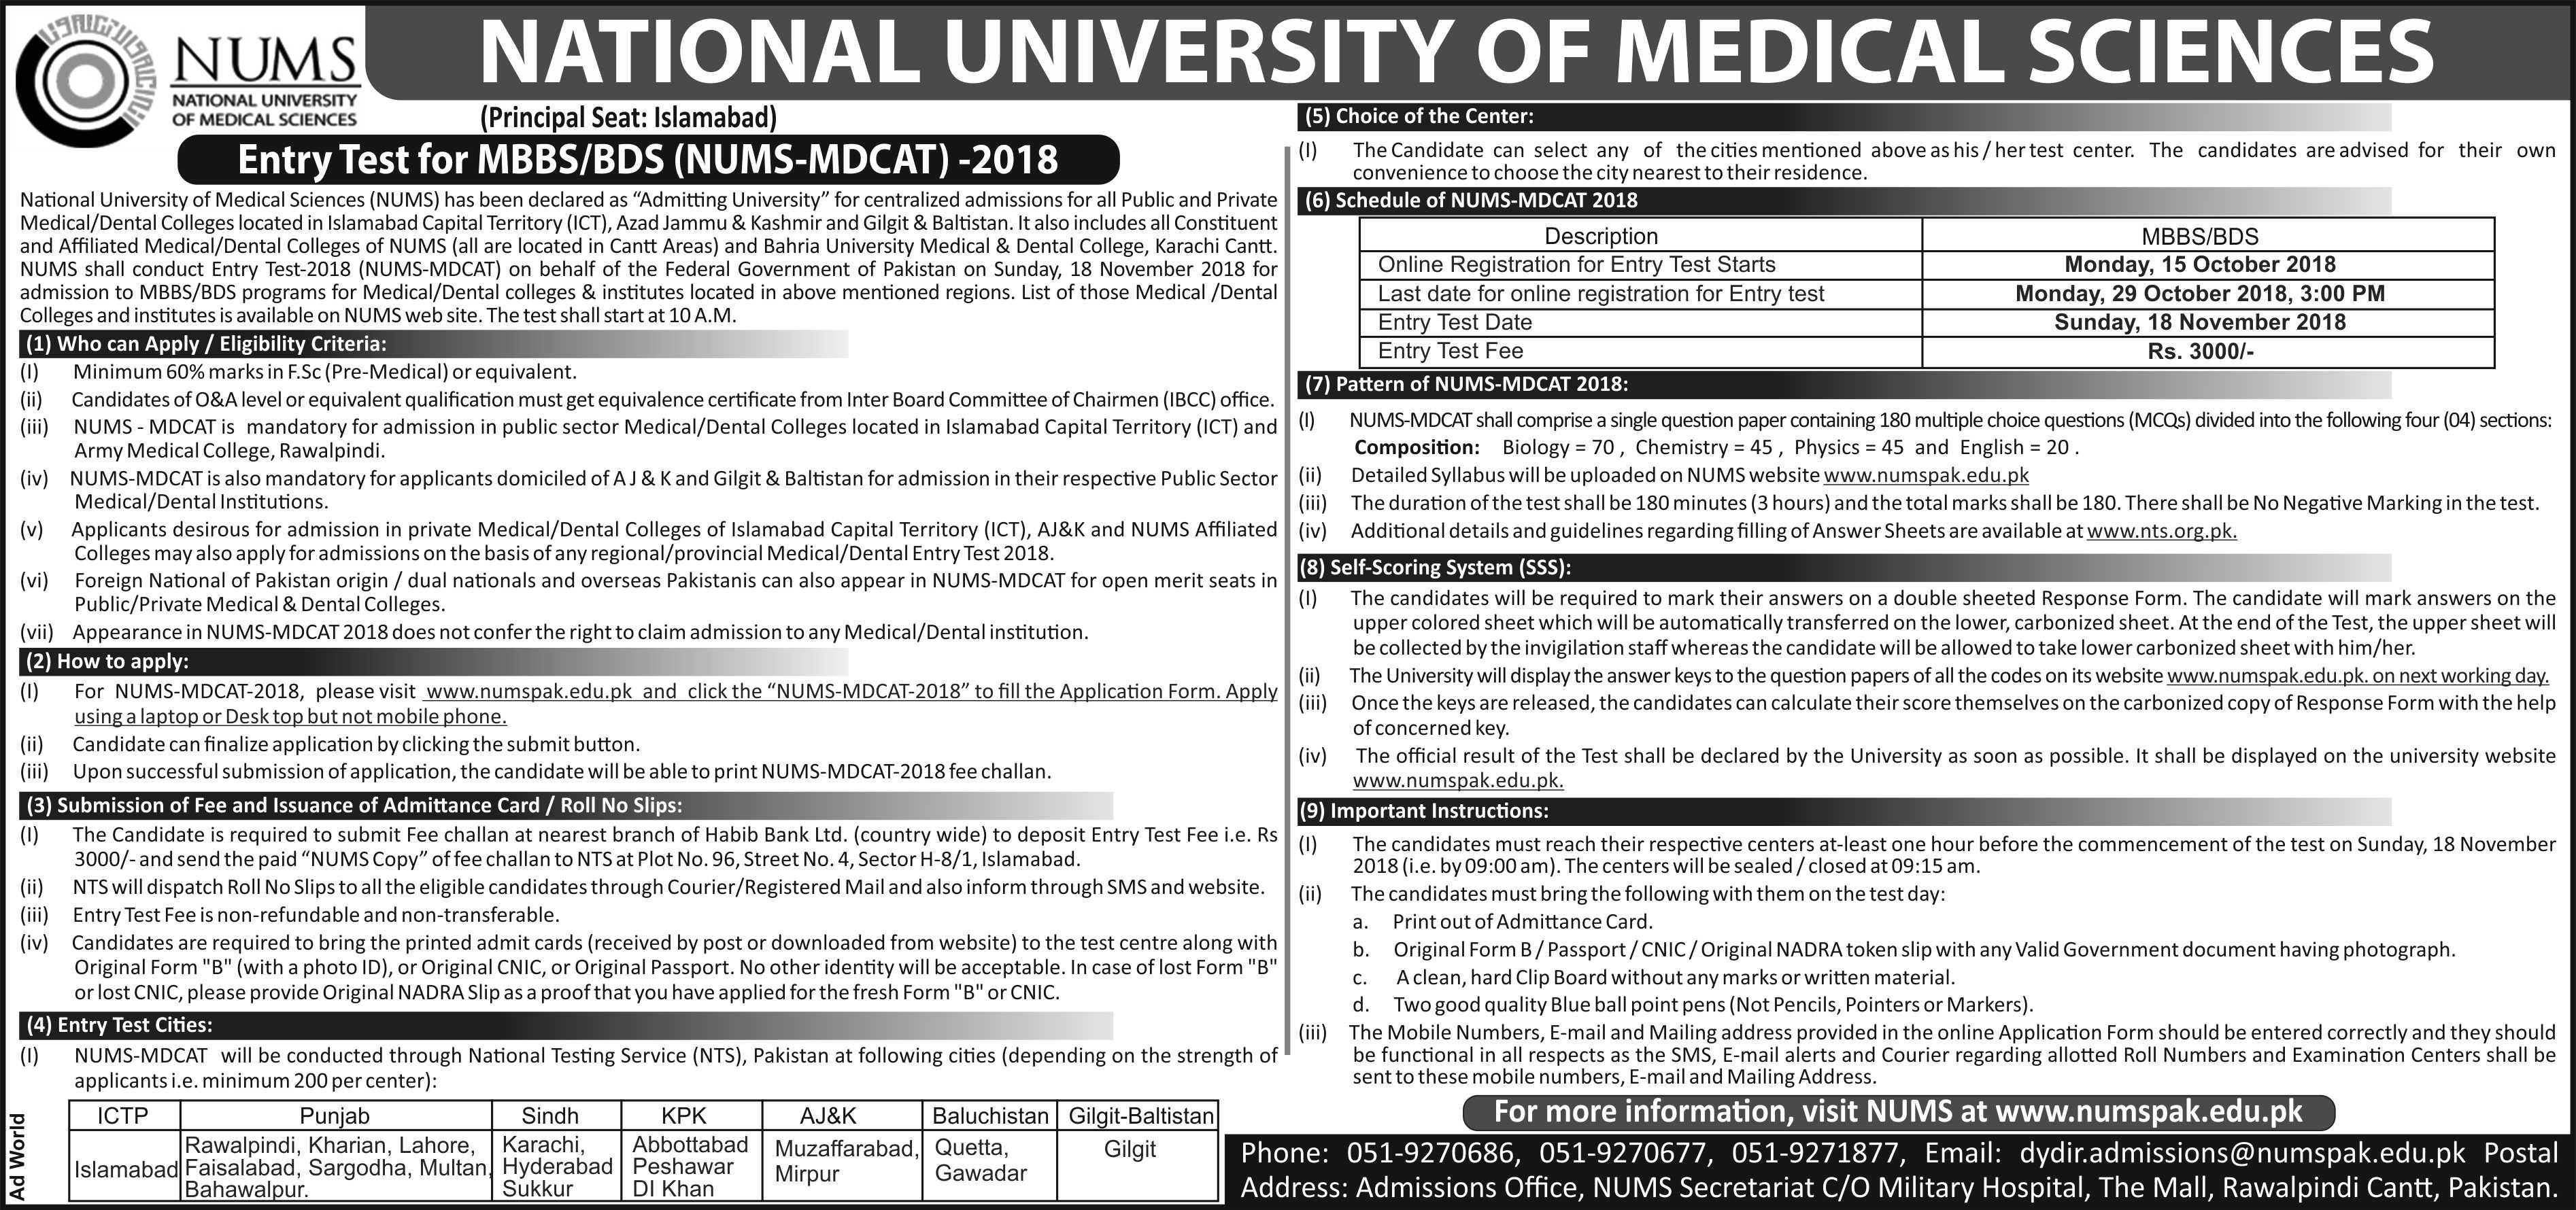 National University Of Medical Sciences Admission 2018